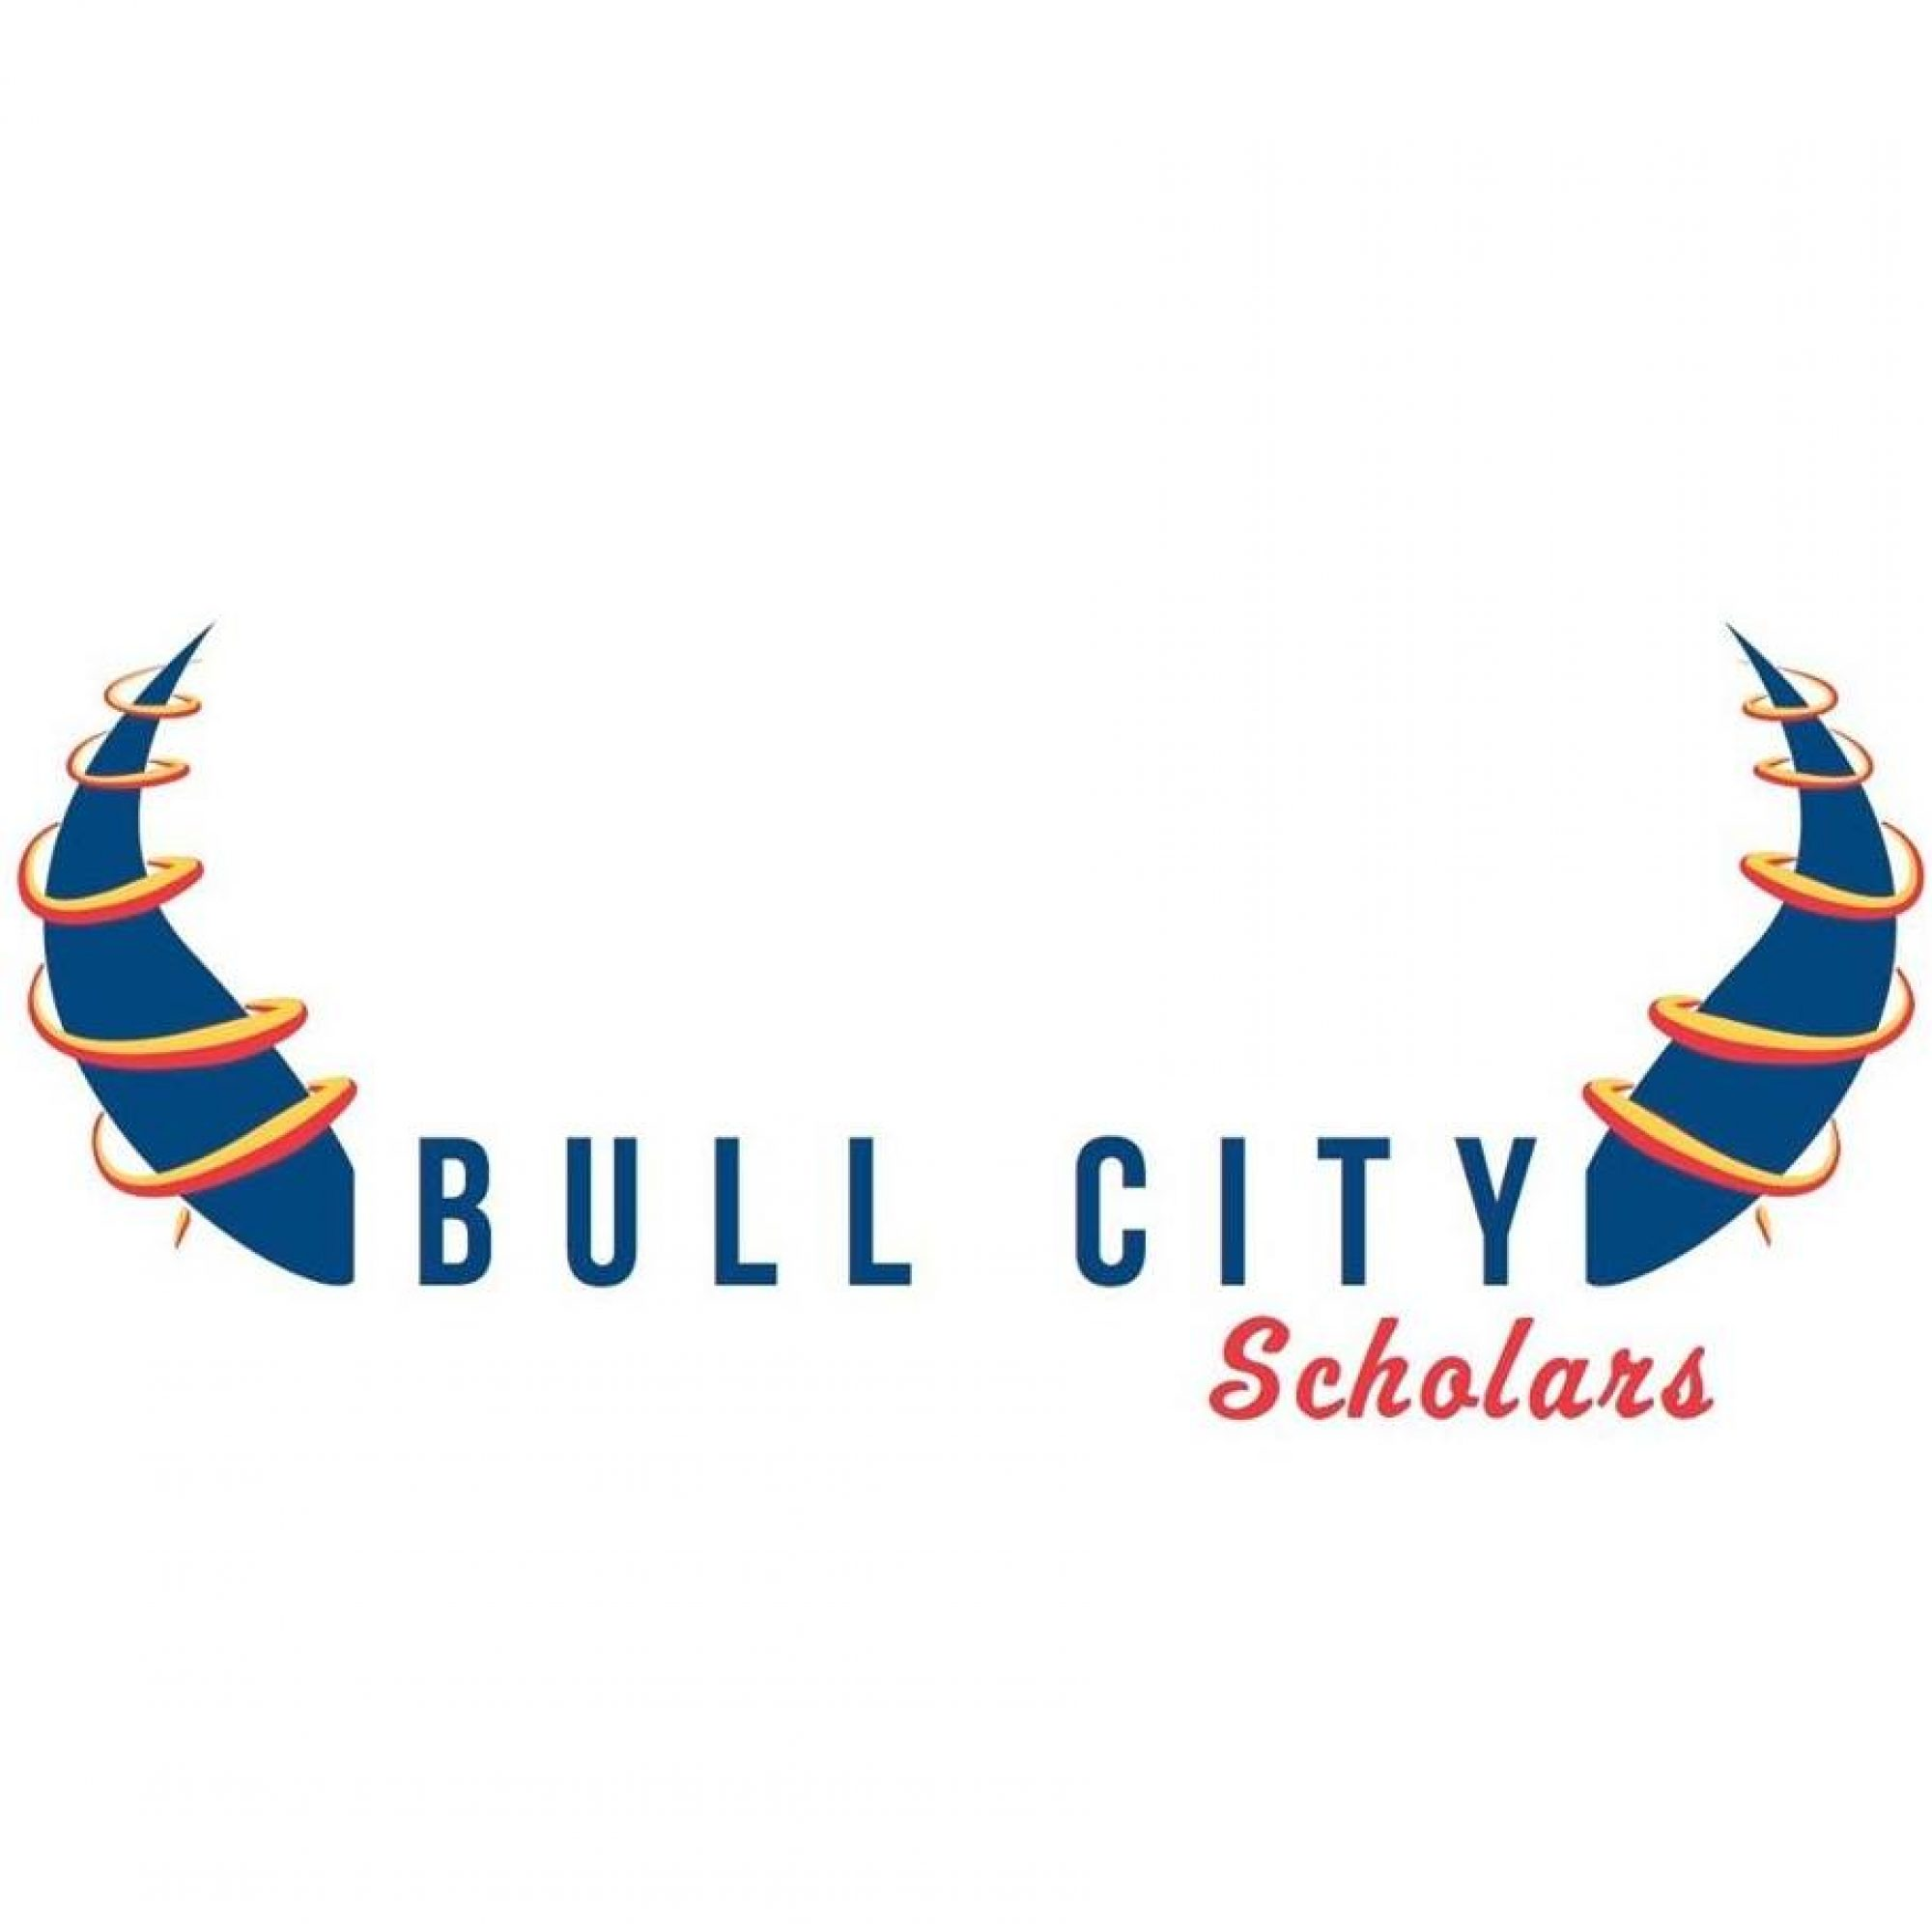 Bull City Scholars